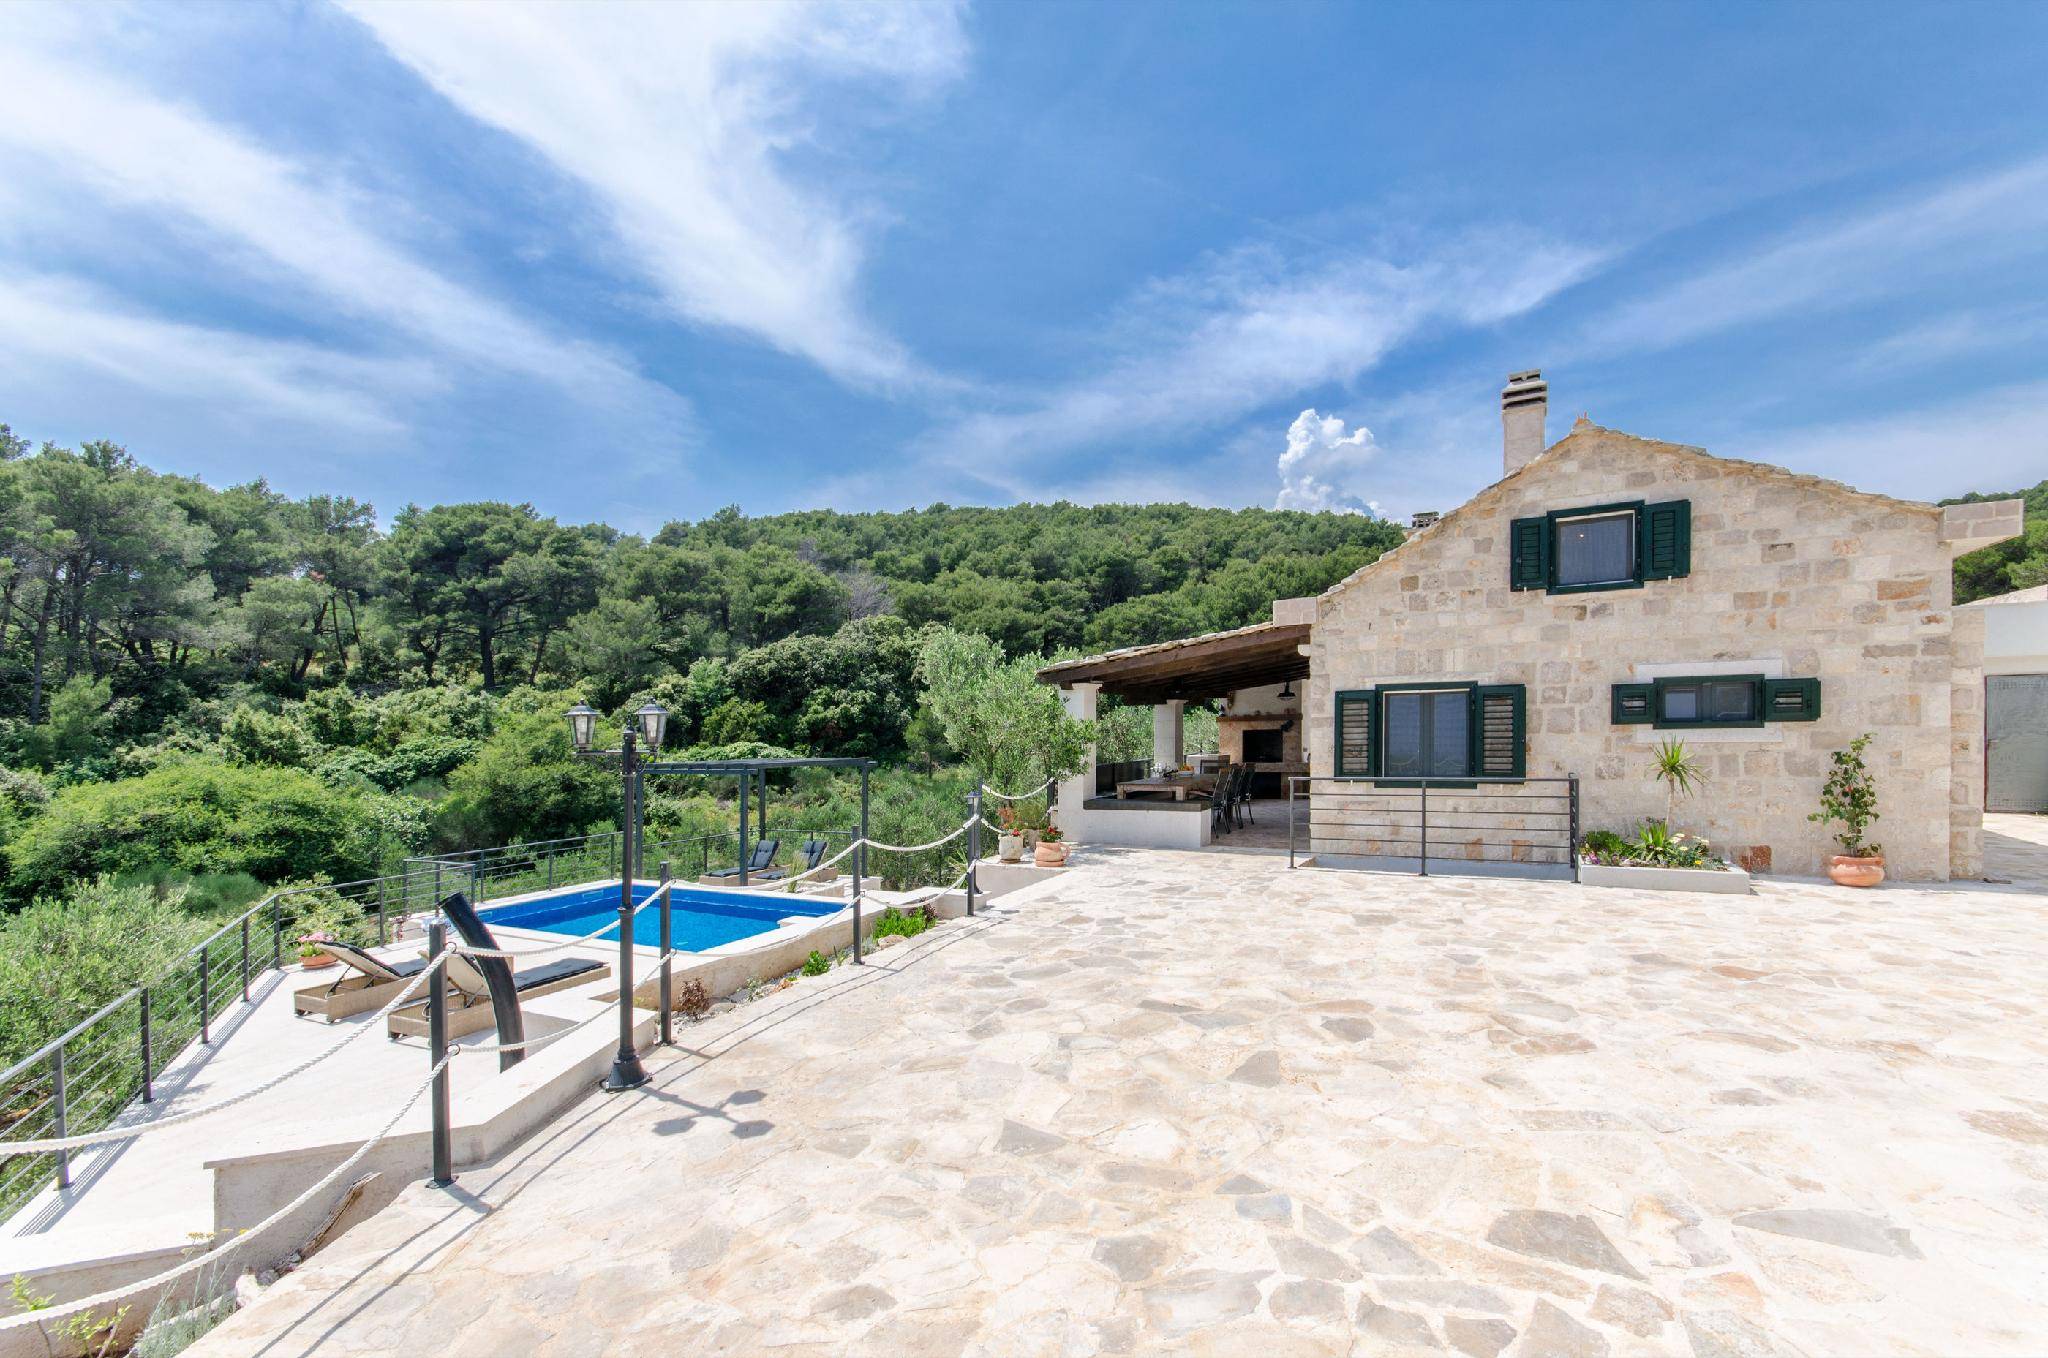 villa rokovo vall brac island croatia rental